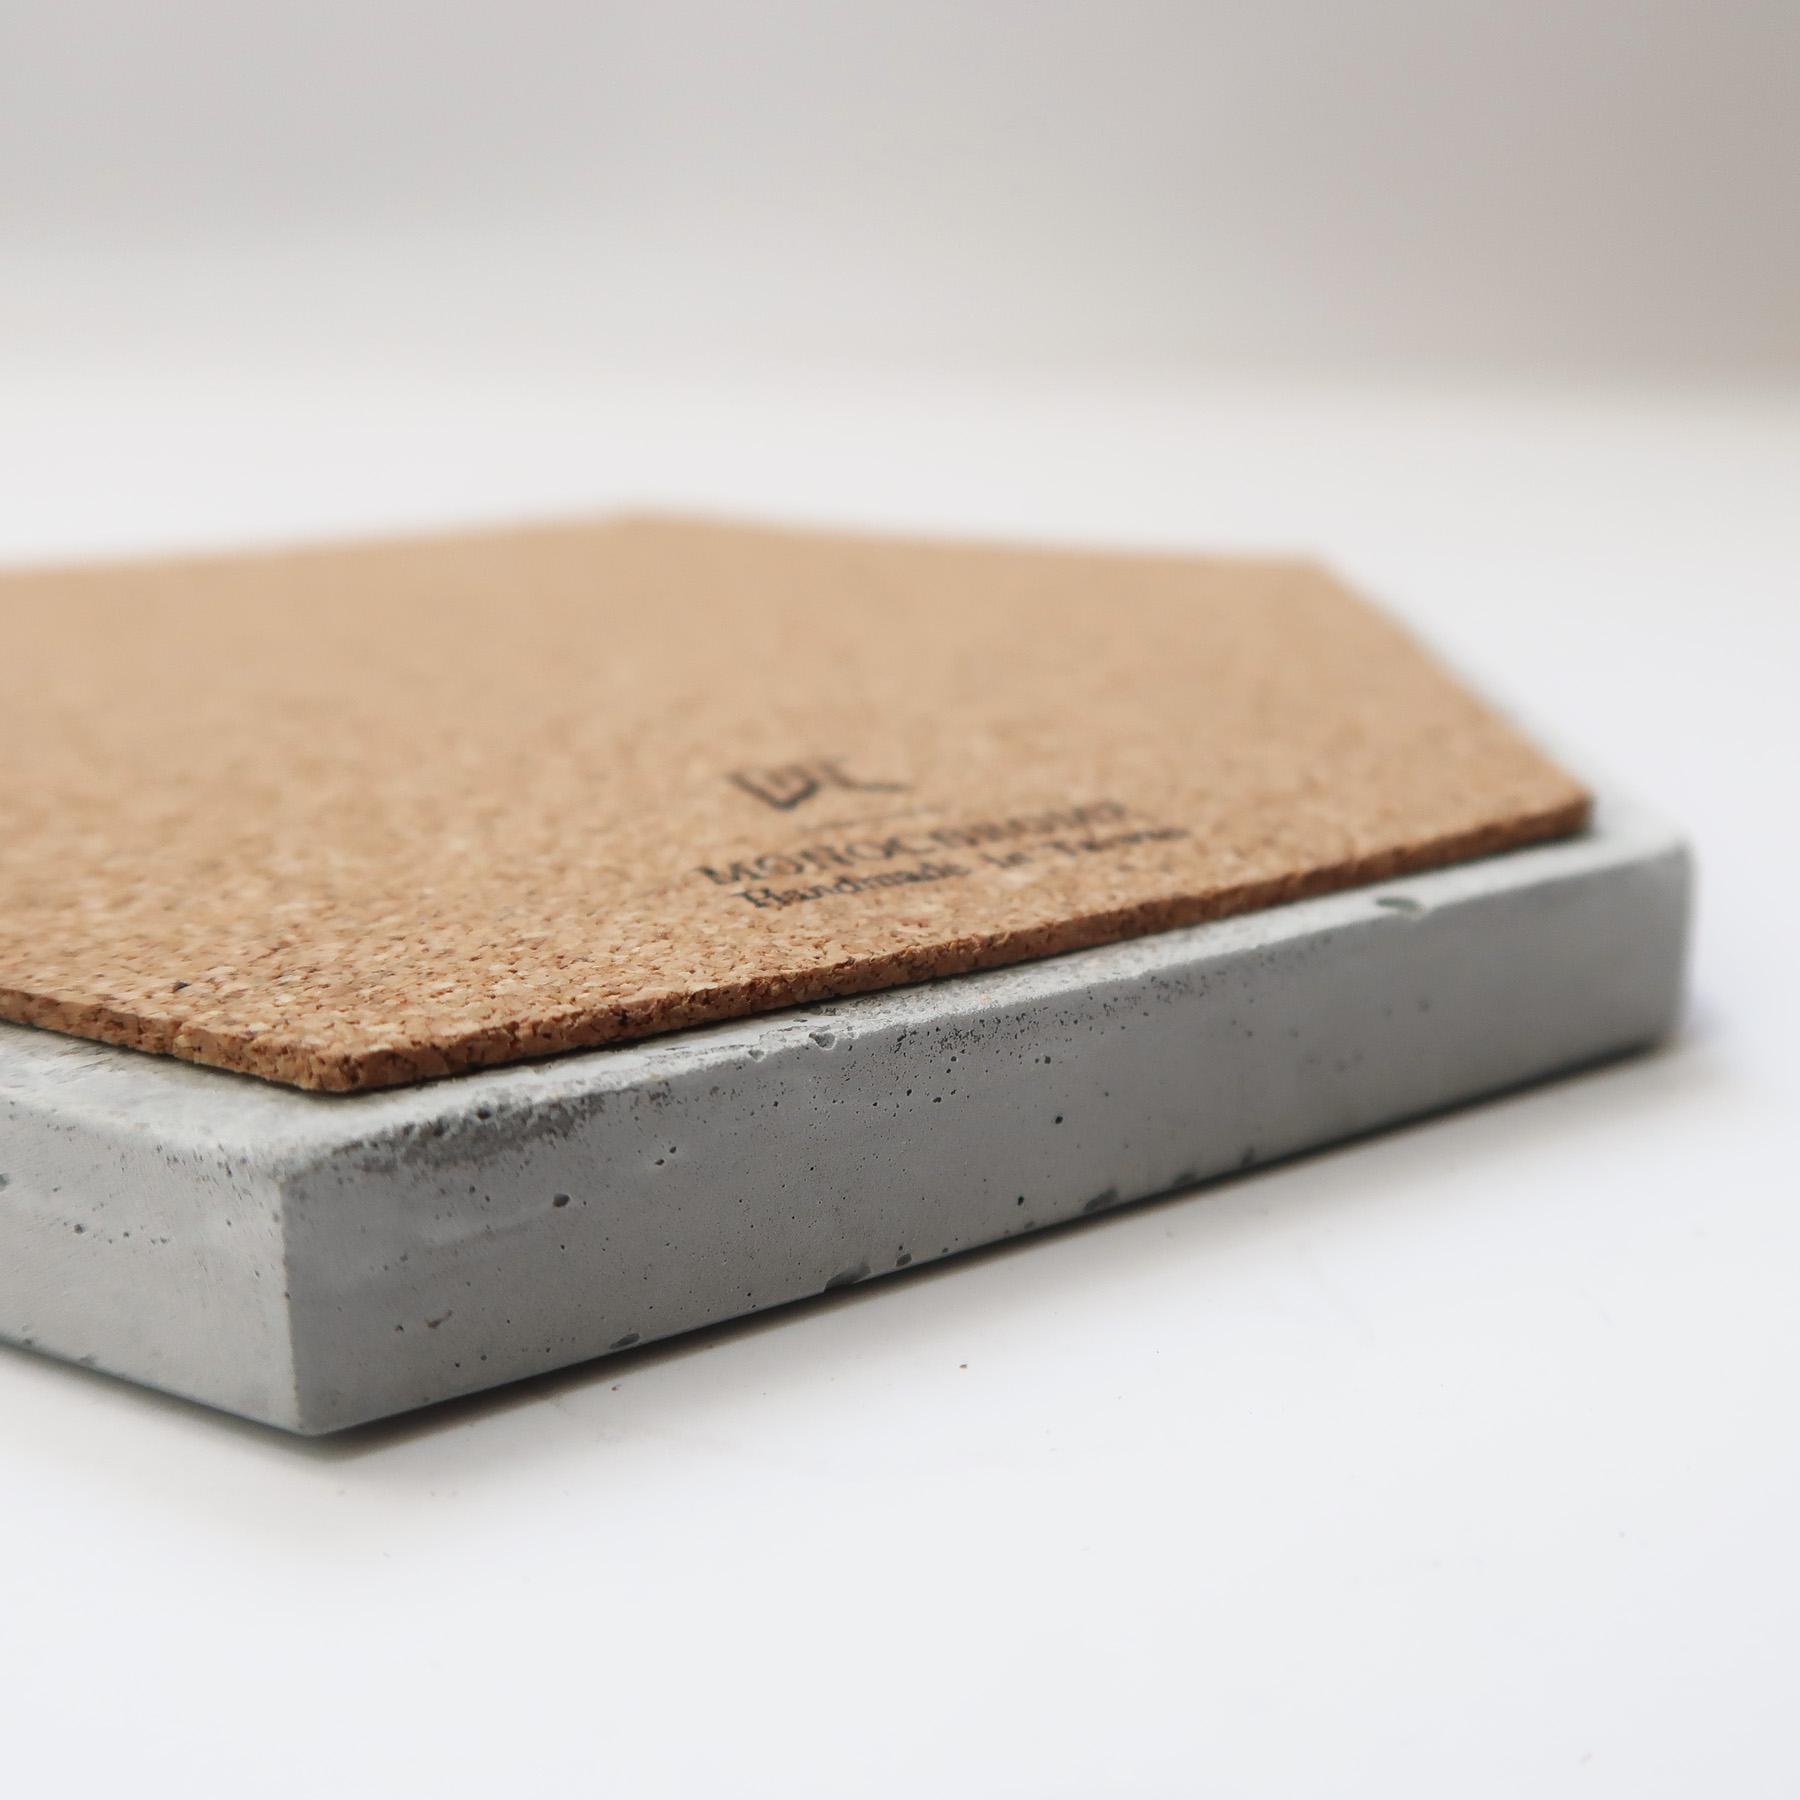 Concrete Design 水泥飾盤玻璃鐘罩・居家擺飾・飾品陳列